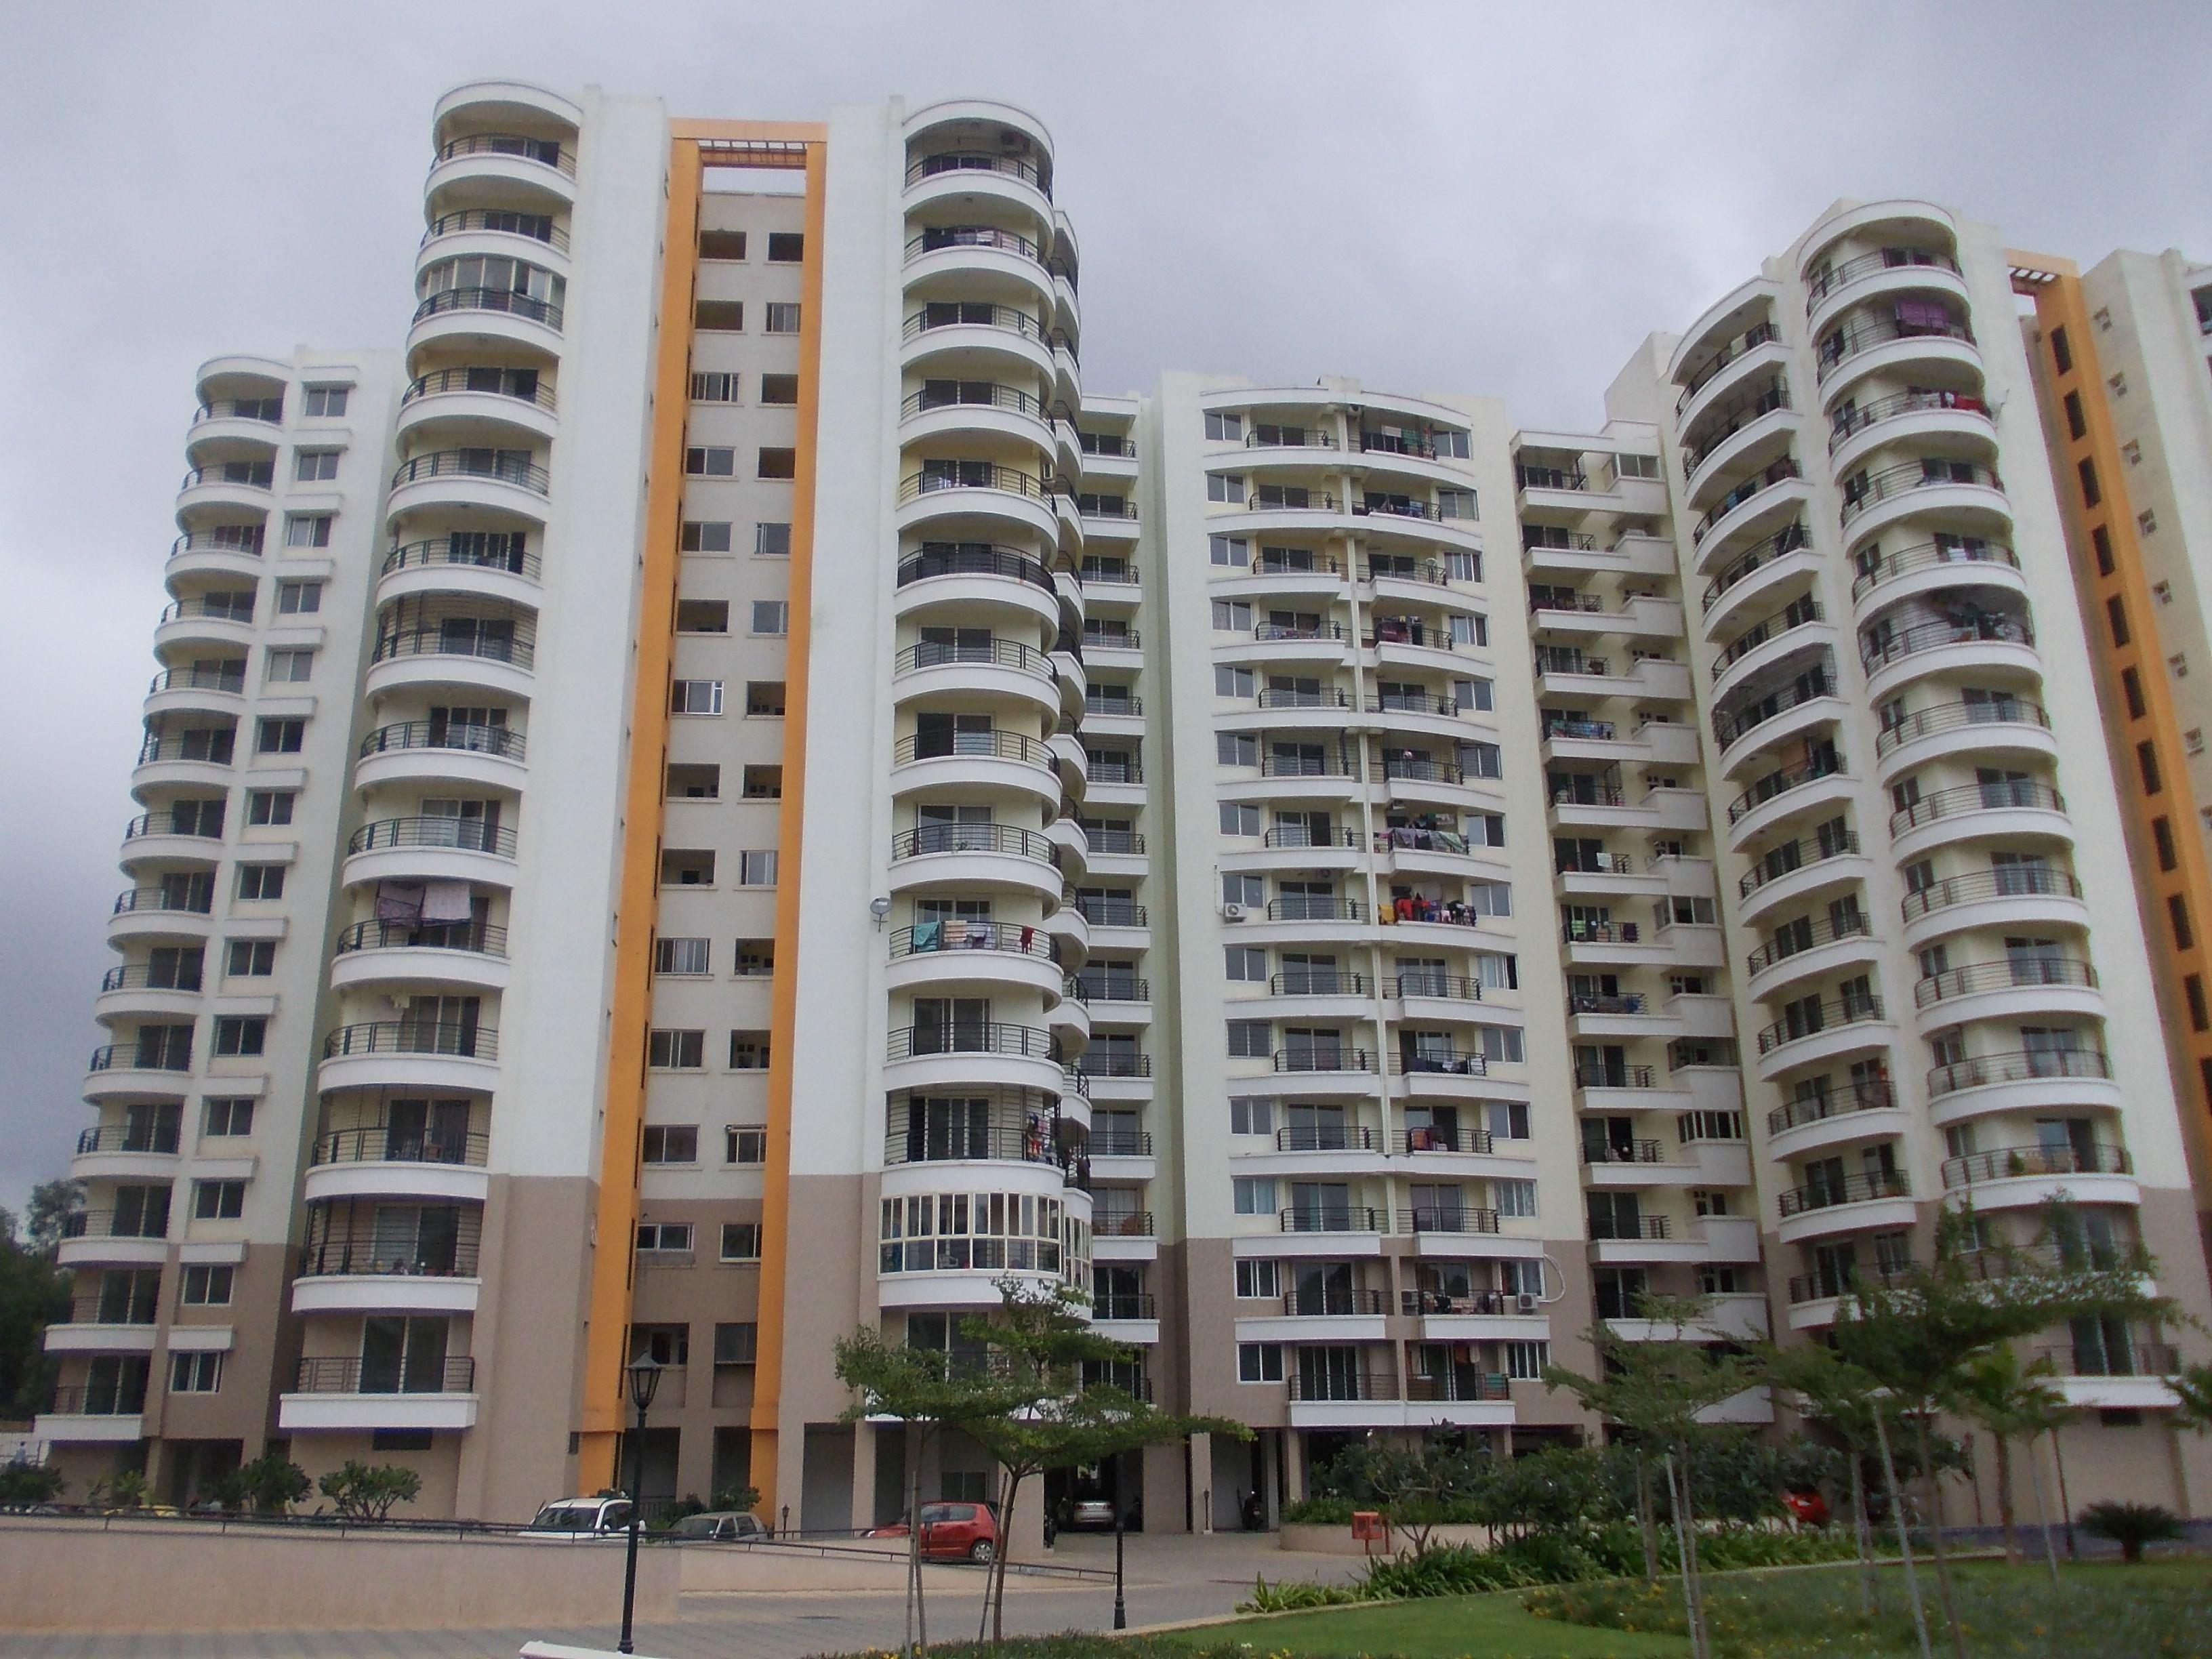 3BHK Apartment for Rent at Yelahanka Bangalore Flat